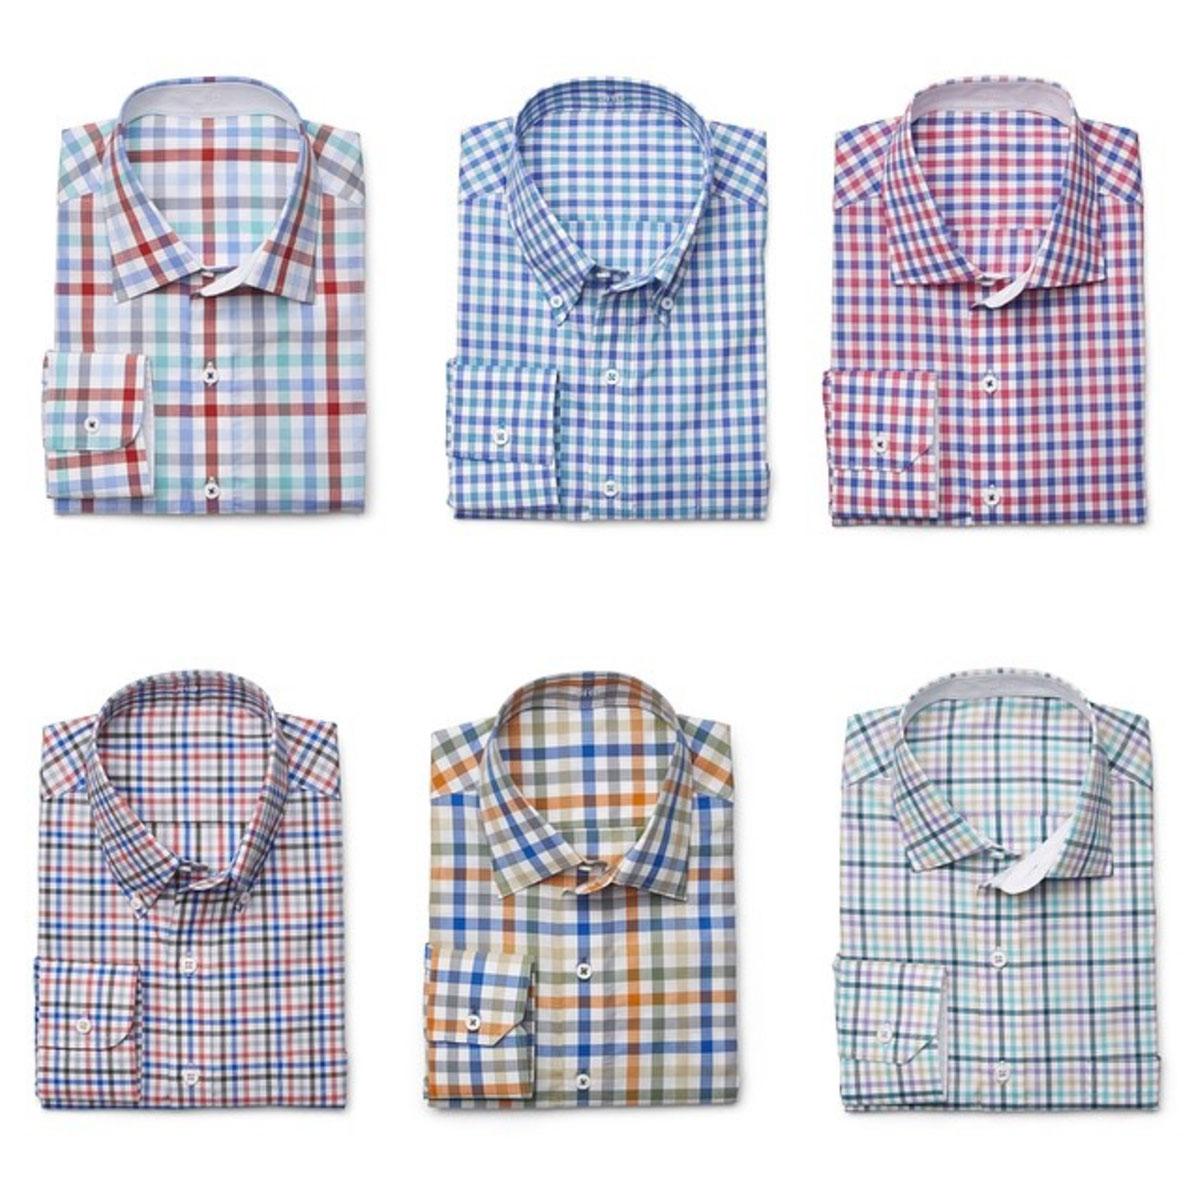 Custom Menswear Cranberry PA J Hilburn